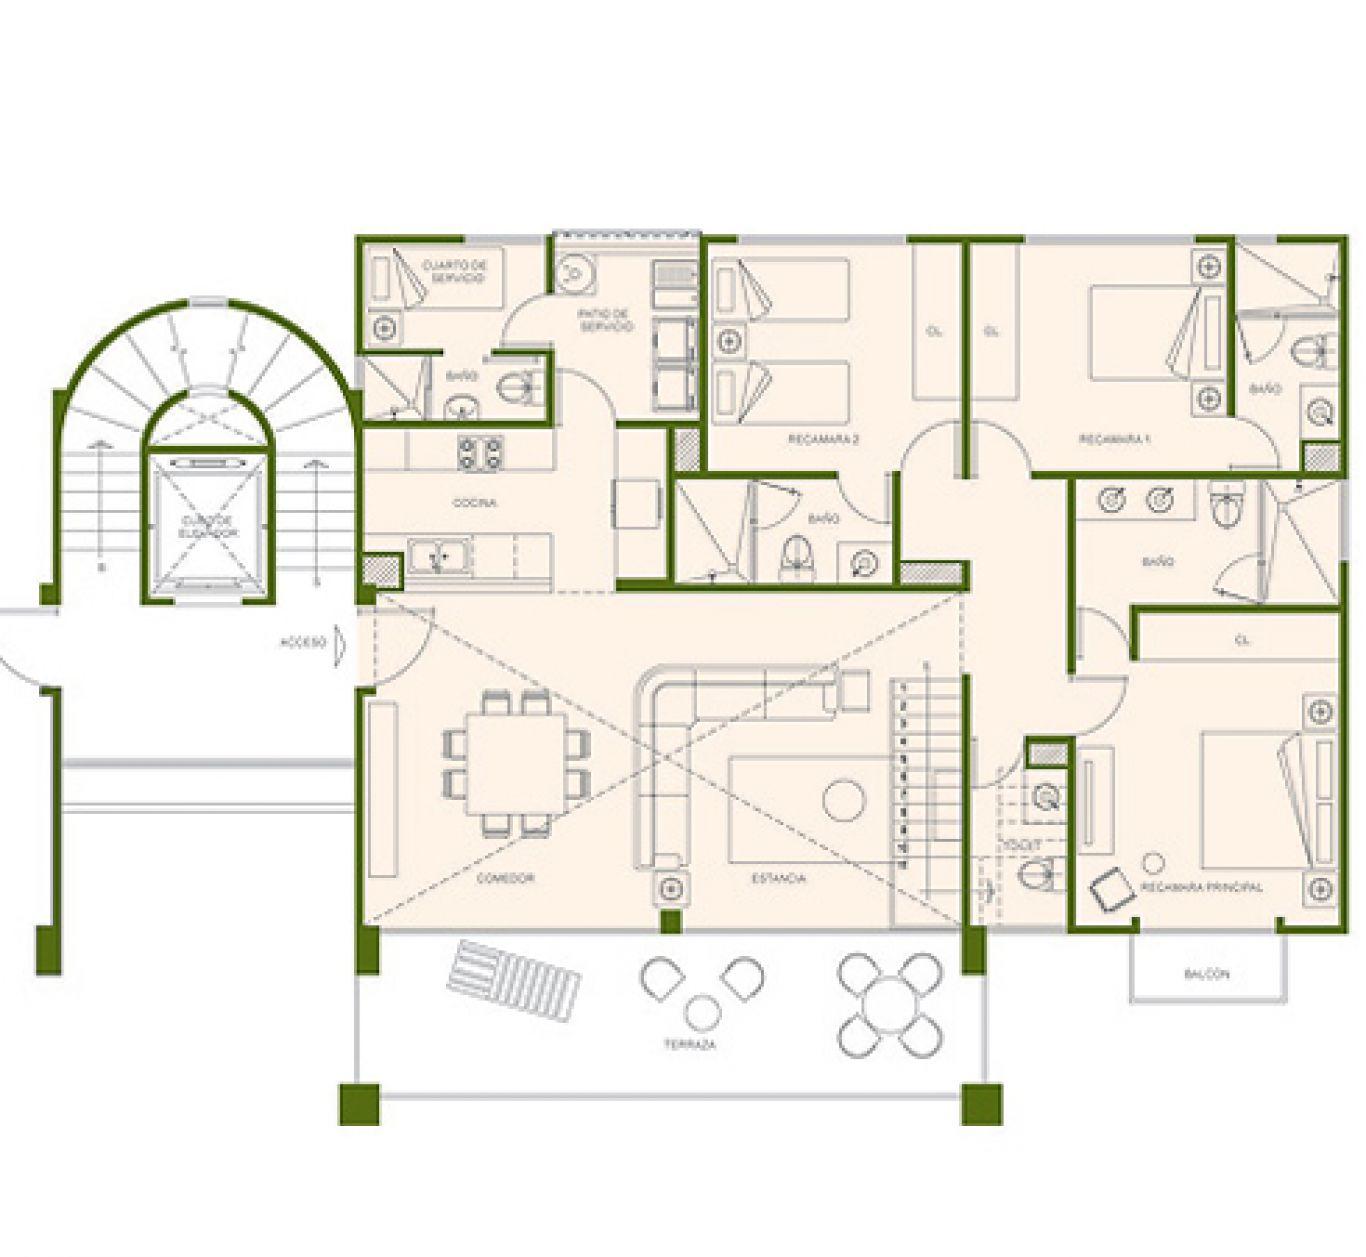 Residencial paraíso country club, id 1525184, no 2, plano de eagle ph, 407